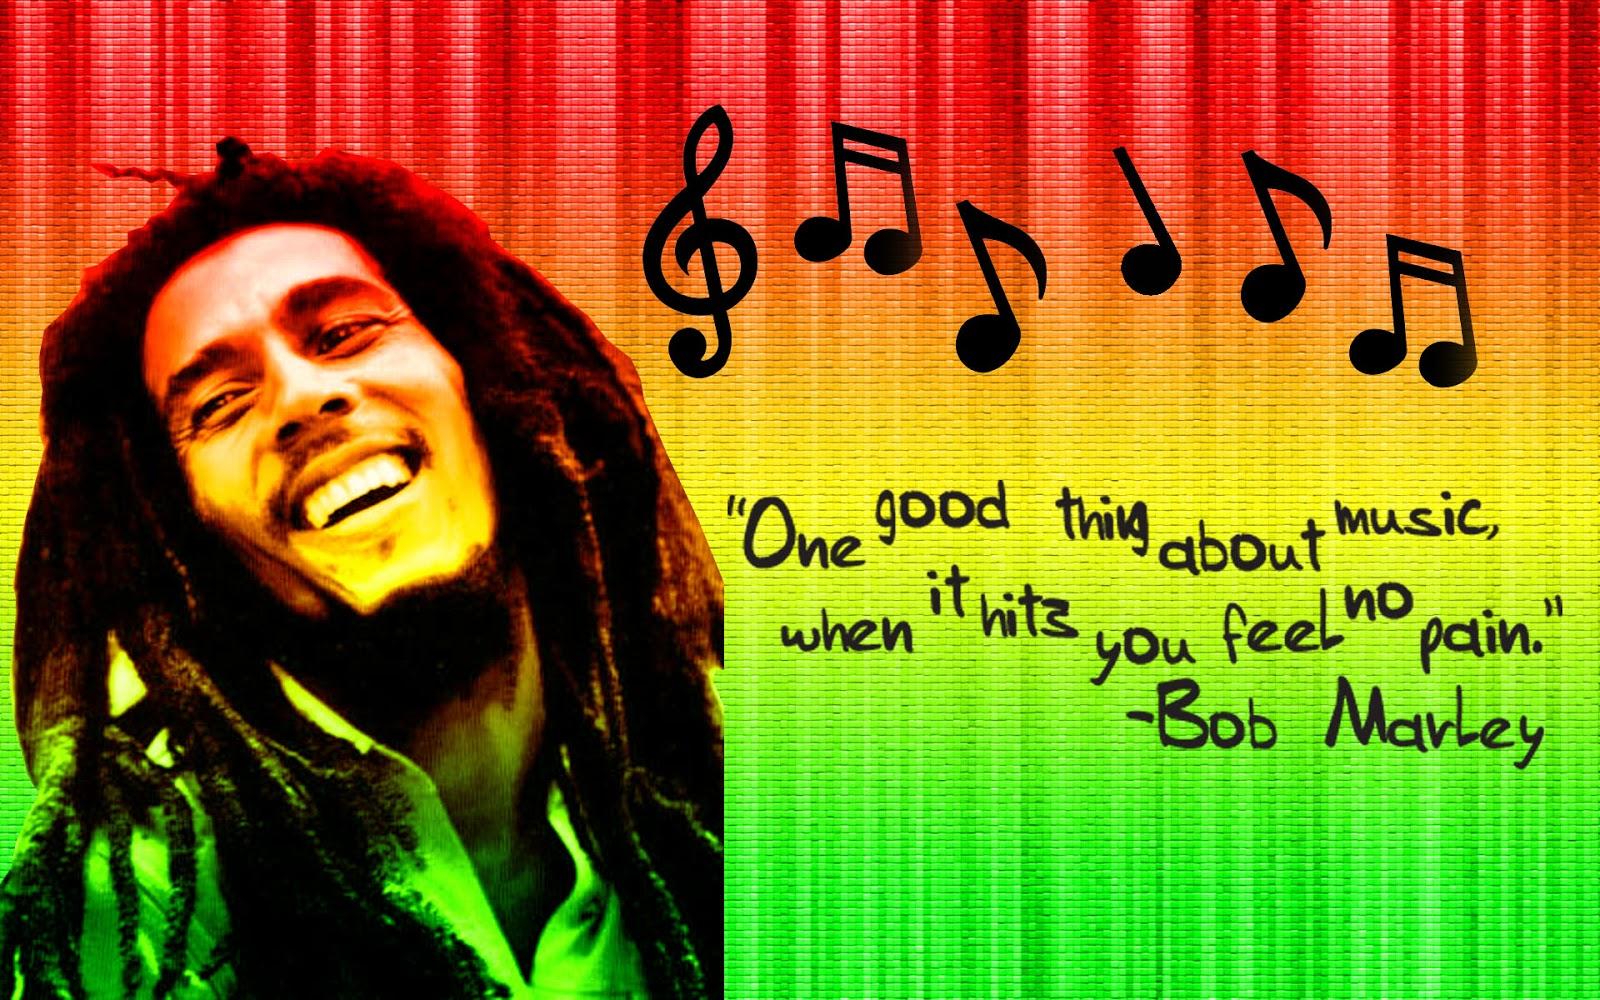 Frases De Bob Marley: Frases De Bob Marley: Bob Marley